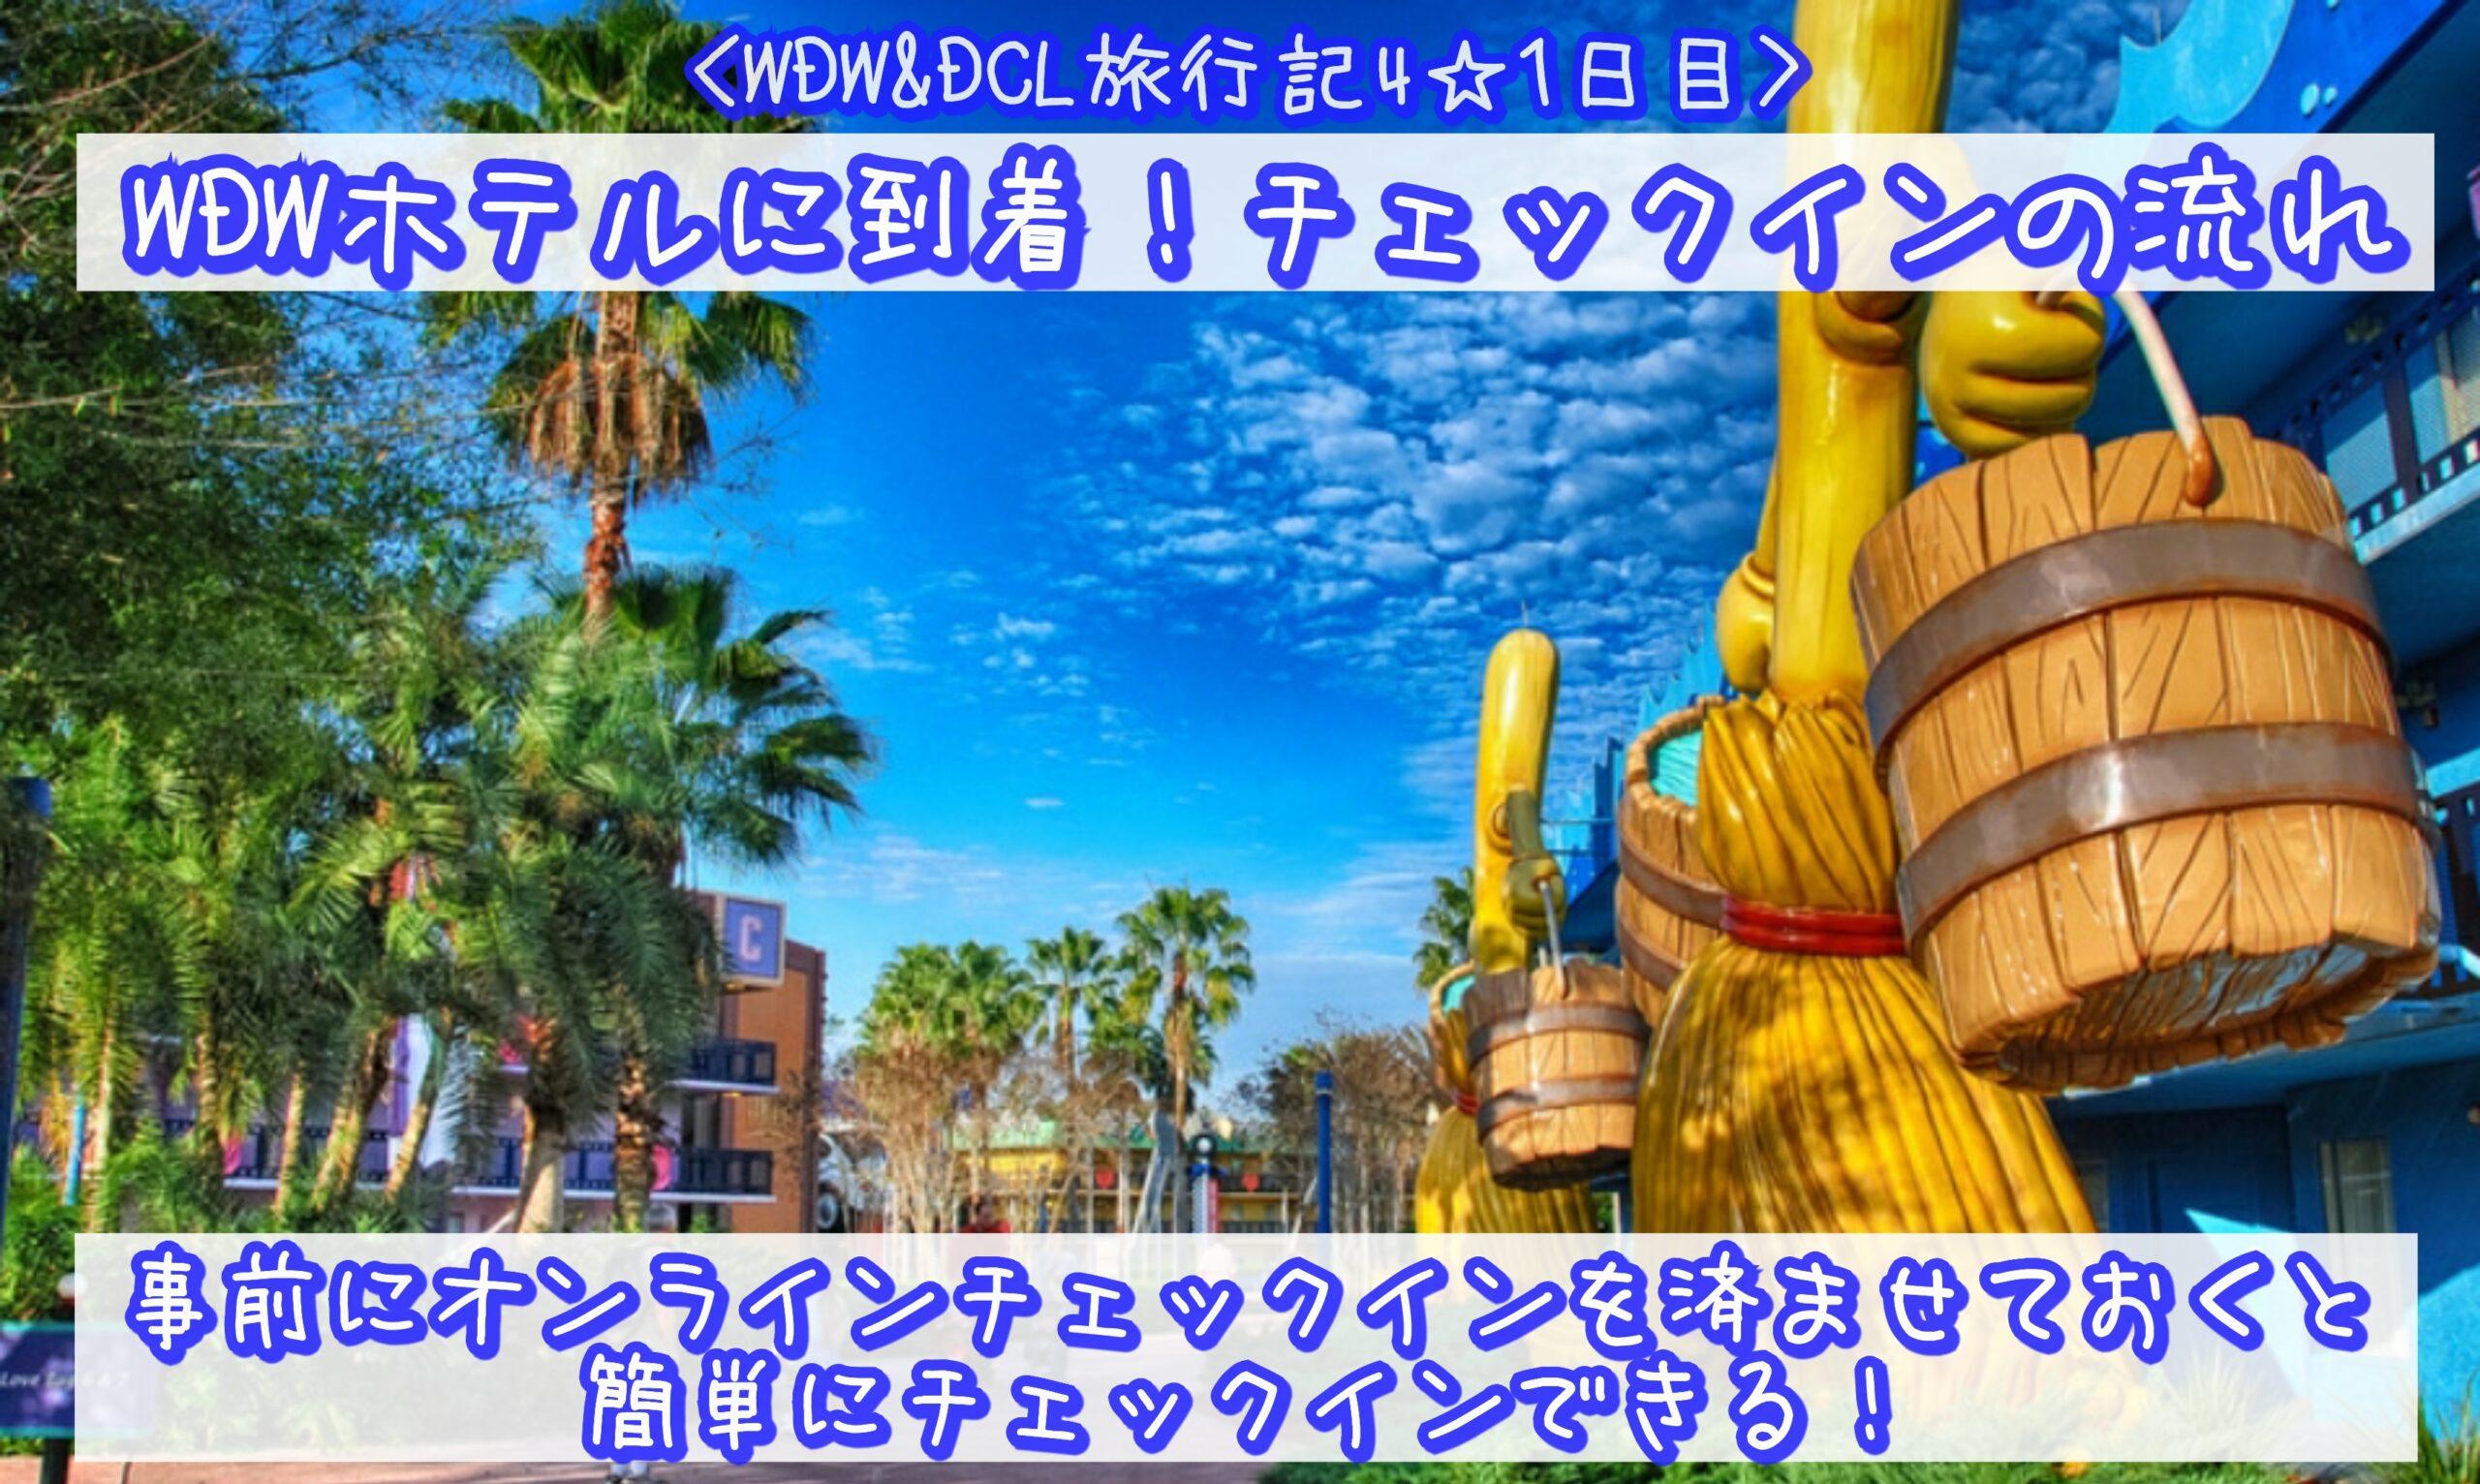 【WDW&DCL】WDWホテルに到着!チェックインの流れ 事前にオンラインチェックインを済ませておくと簡単にチェックインできちゃいます